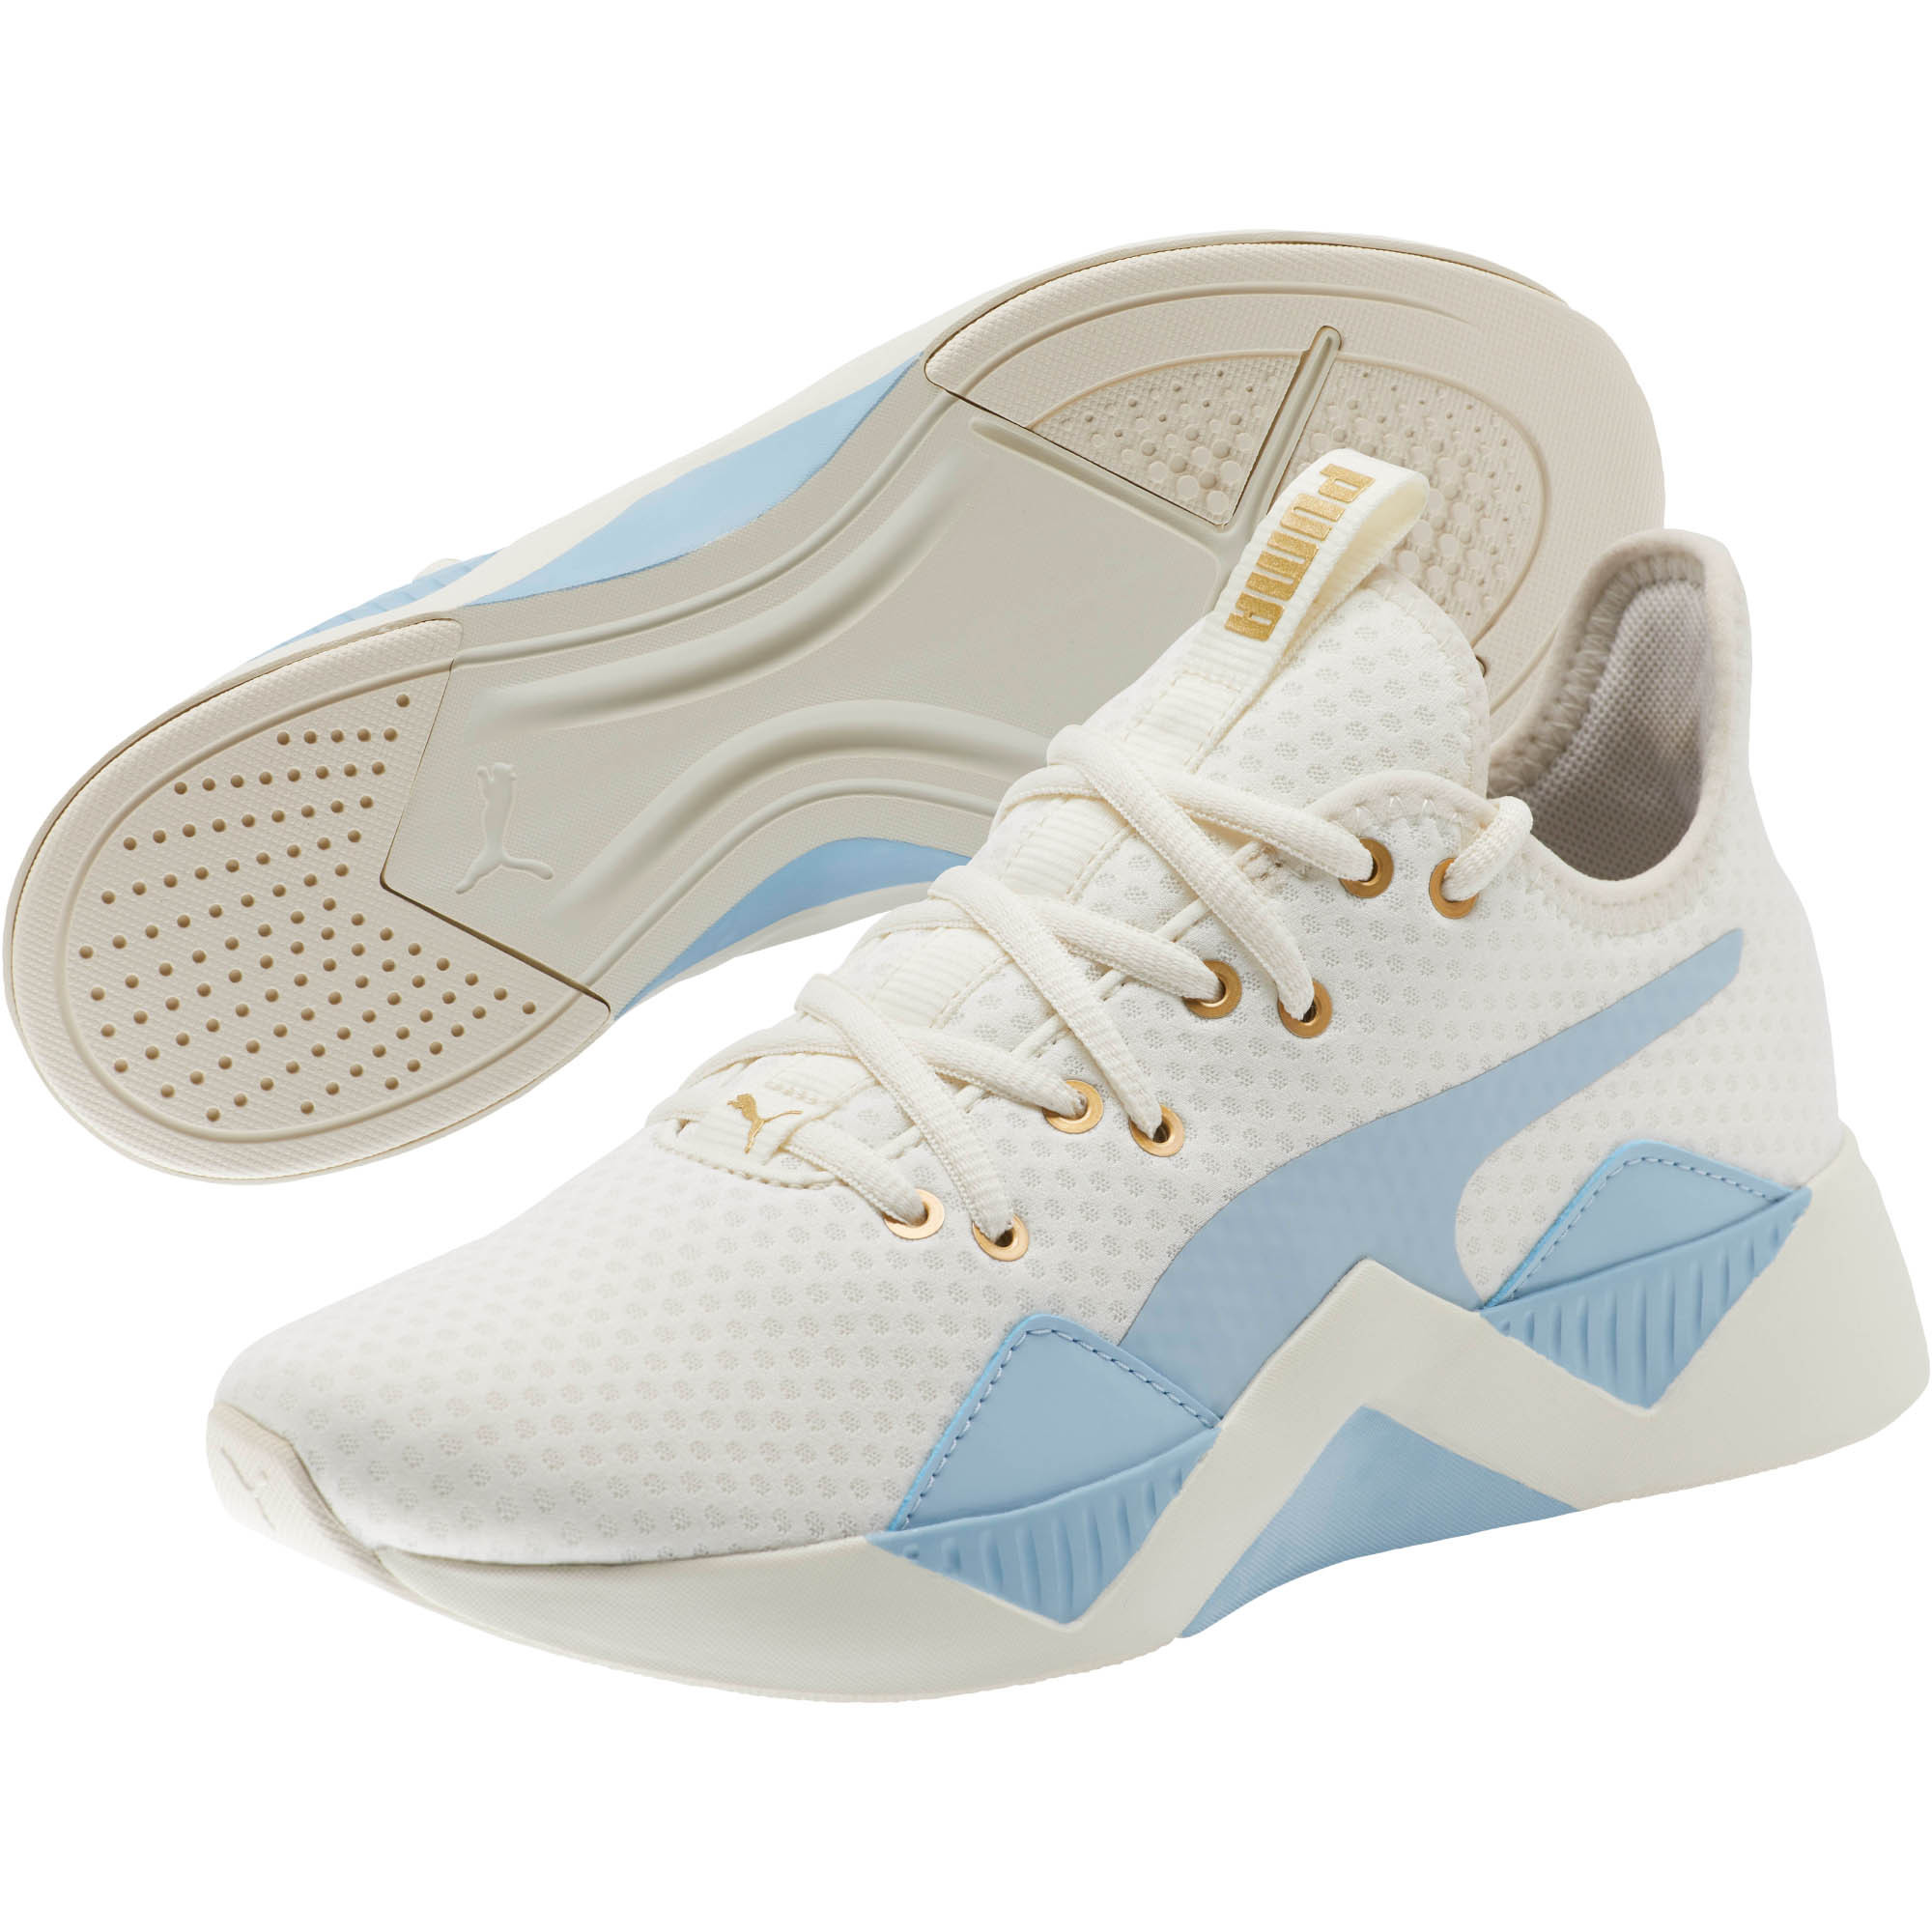 Details about PUMA Incite Sweet Women's Training Shoes Women Shoe Training